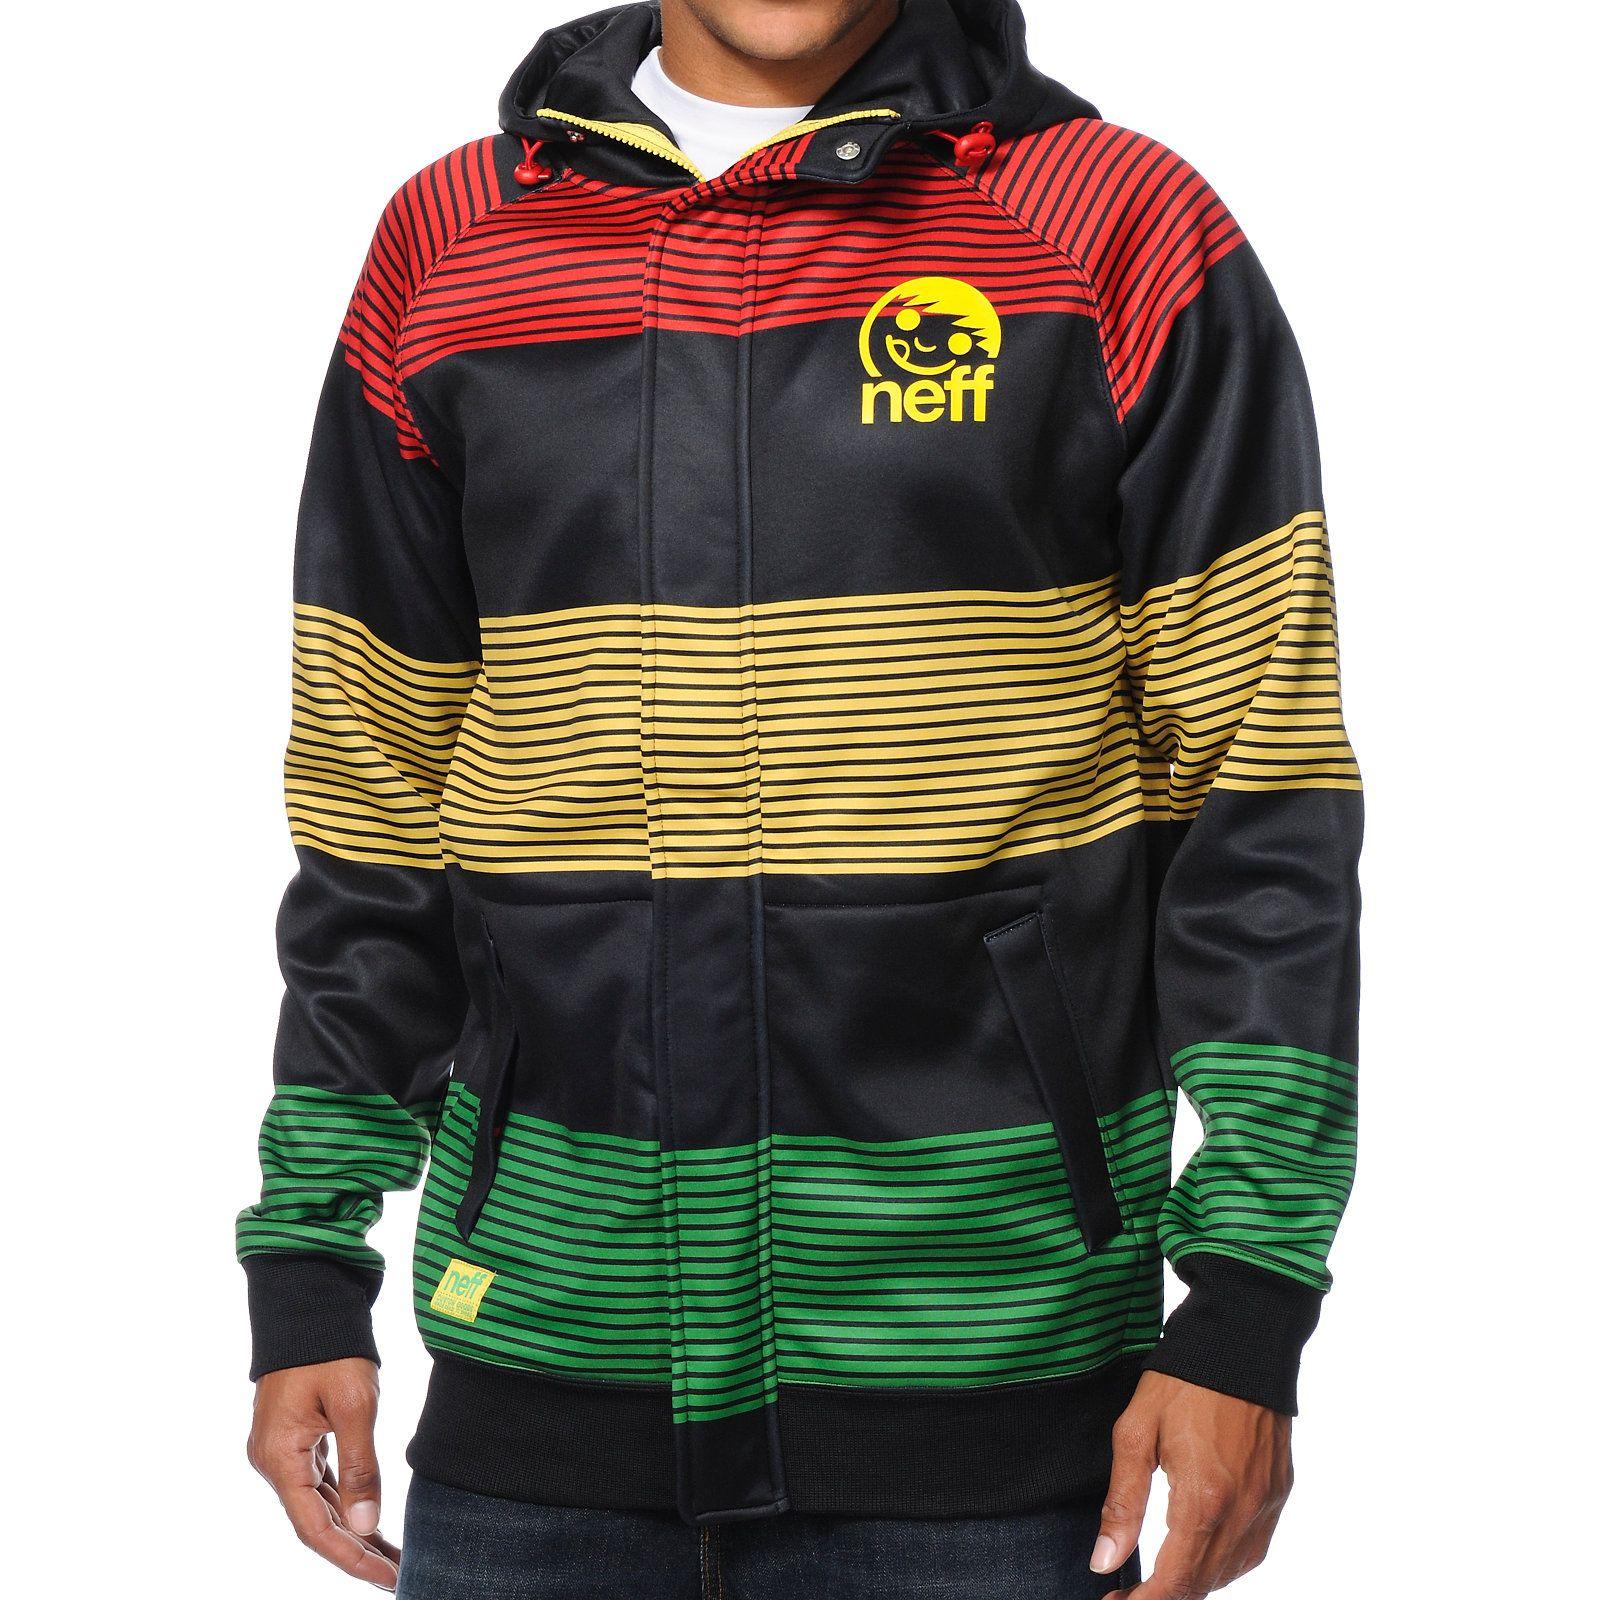 Mens Rasta Tracksuit Set Collared Top Elasticated Waist Trouser Bob Marley at Back